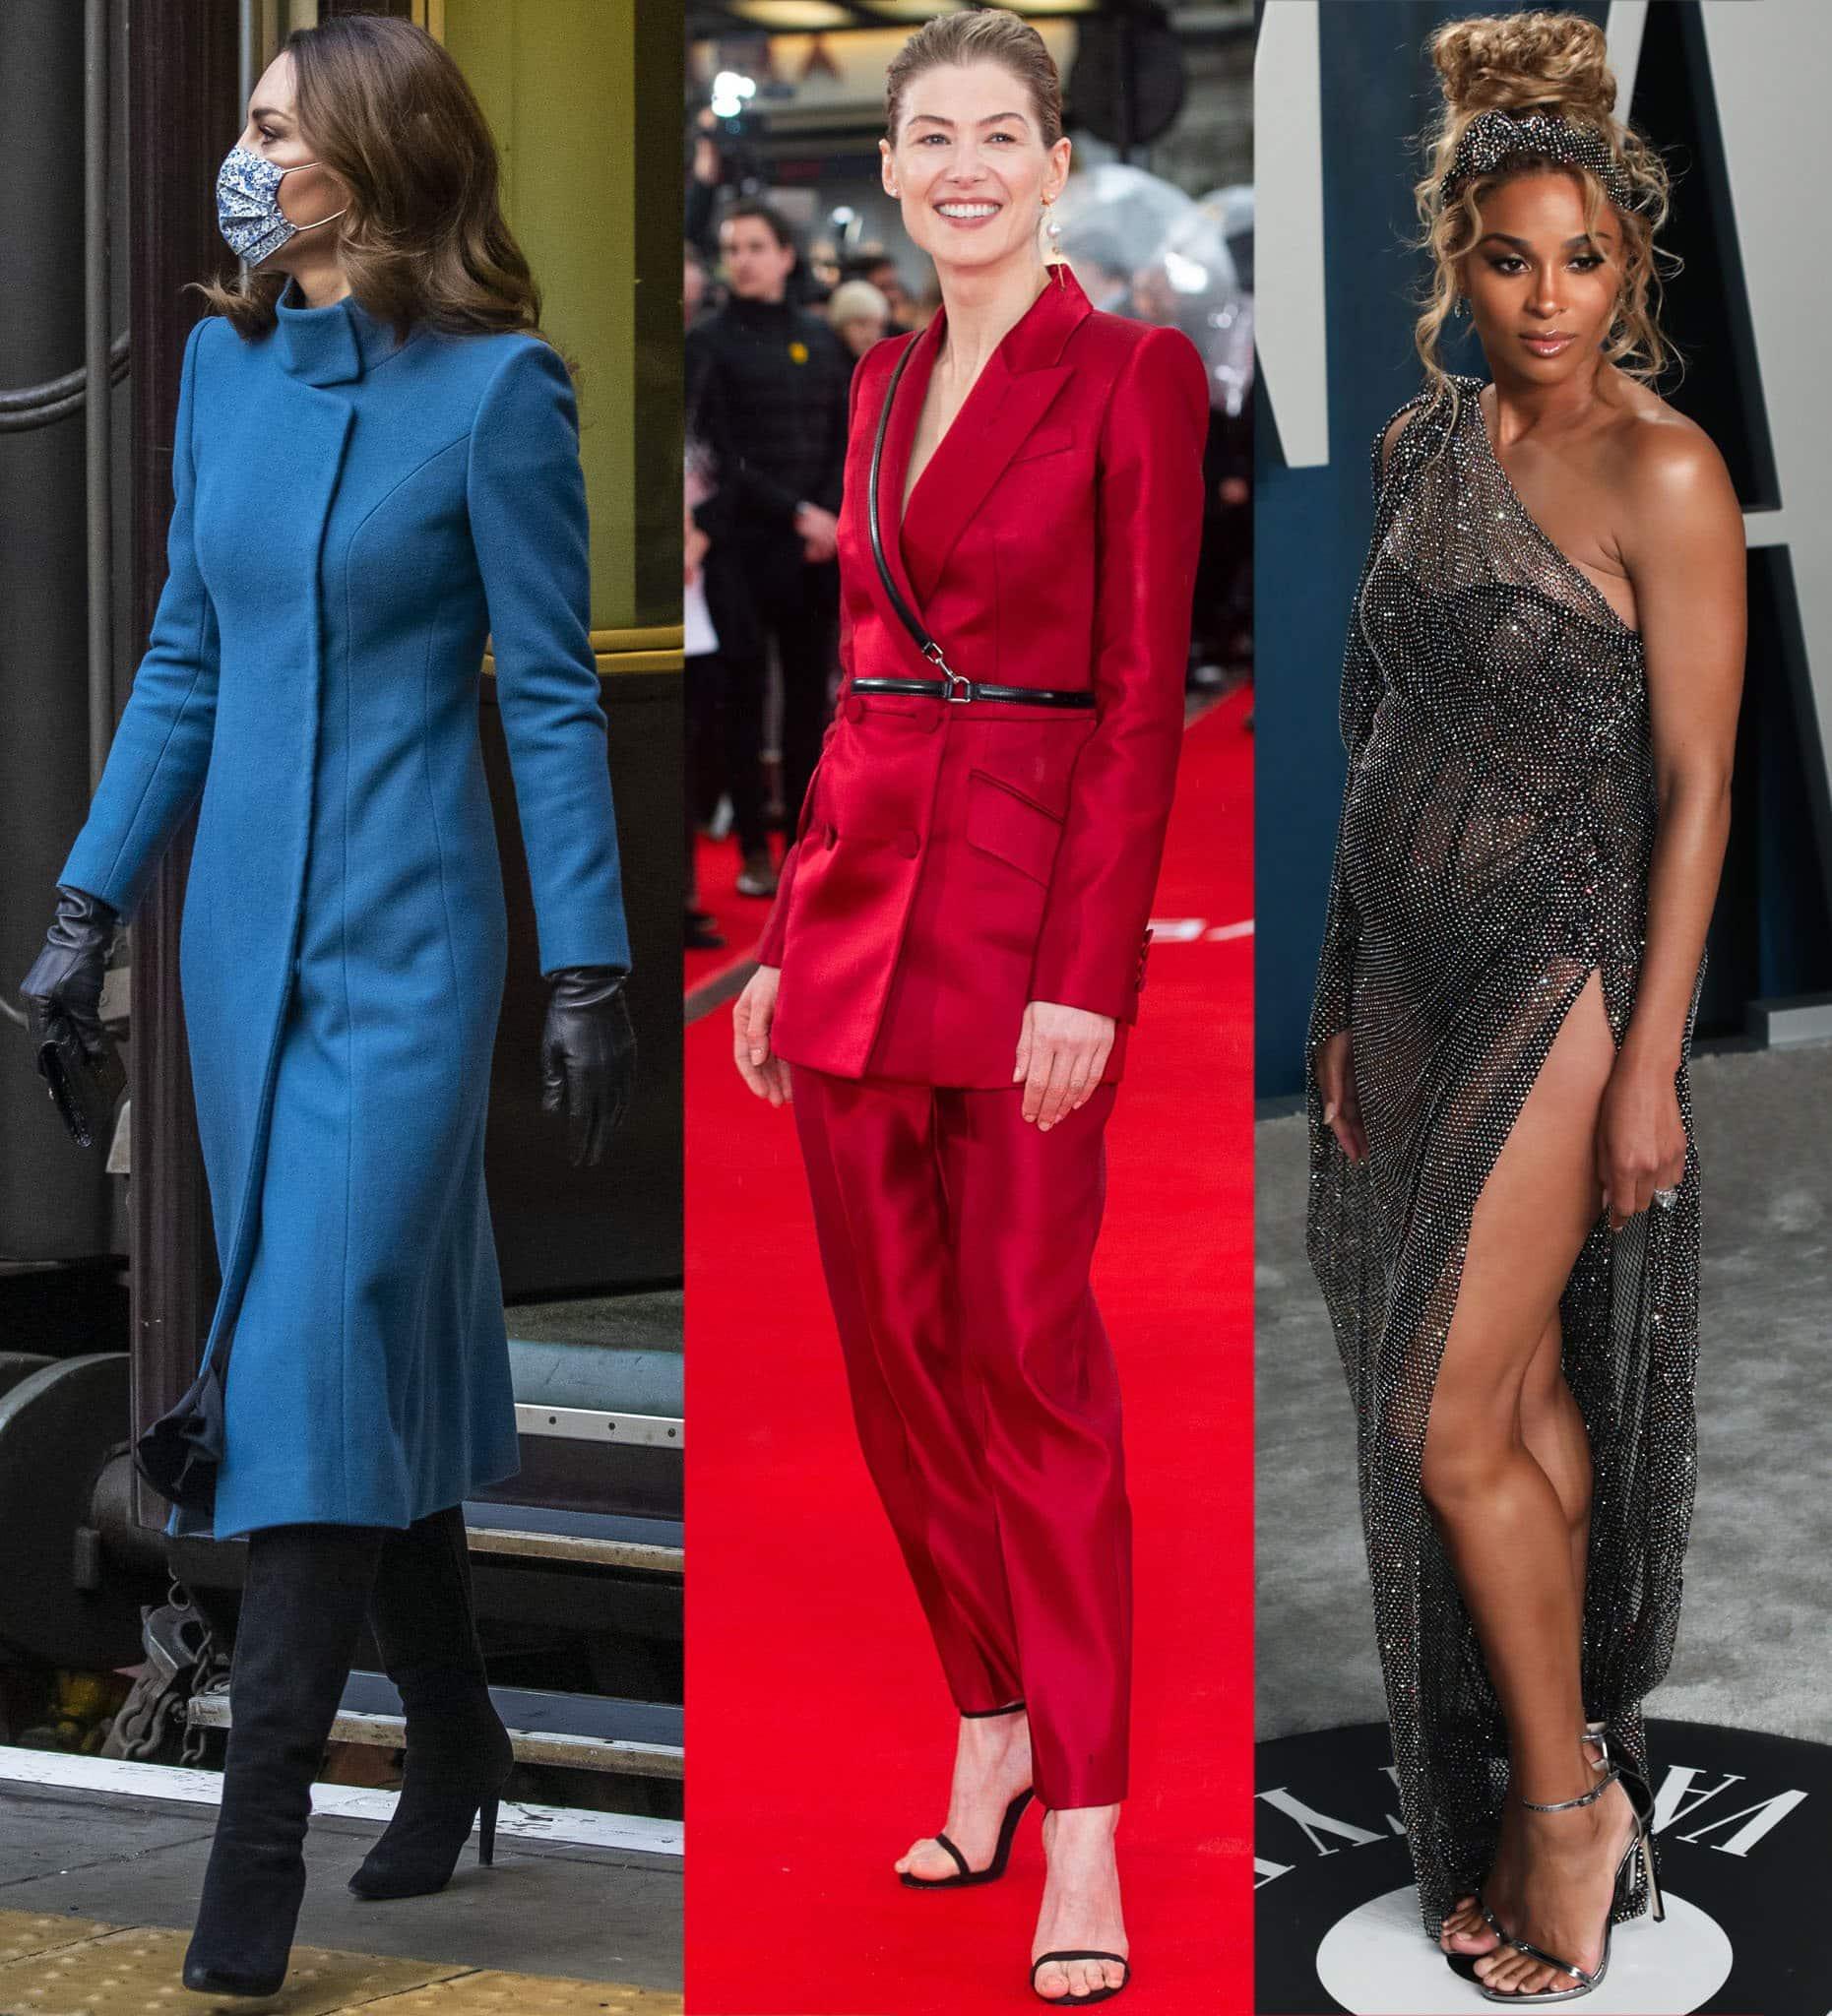 Kate Middleton, Rosamund Pike, and Ciara wearing Stuart Weitzman shoes